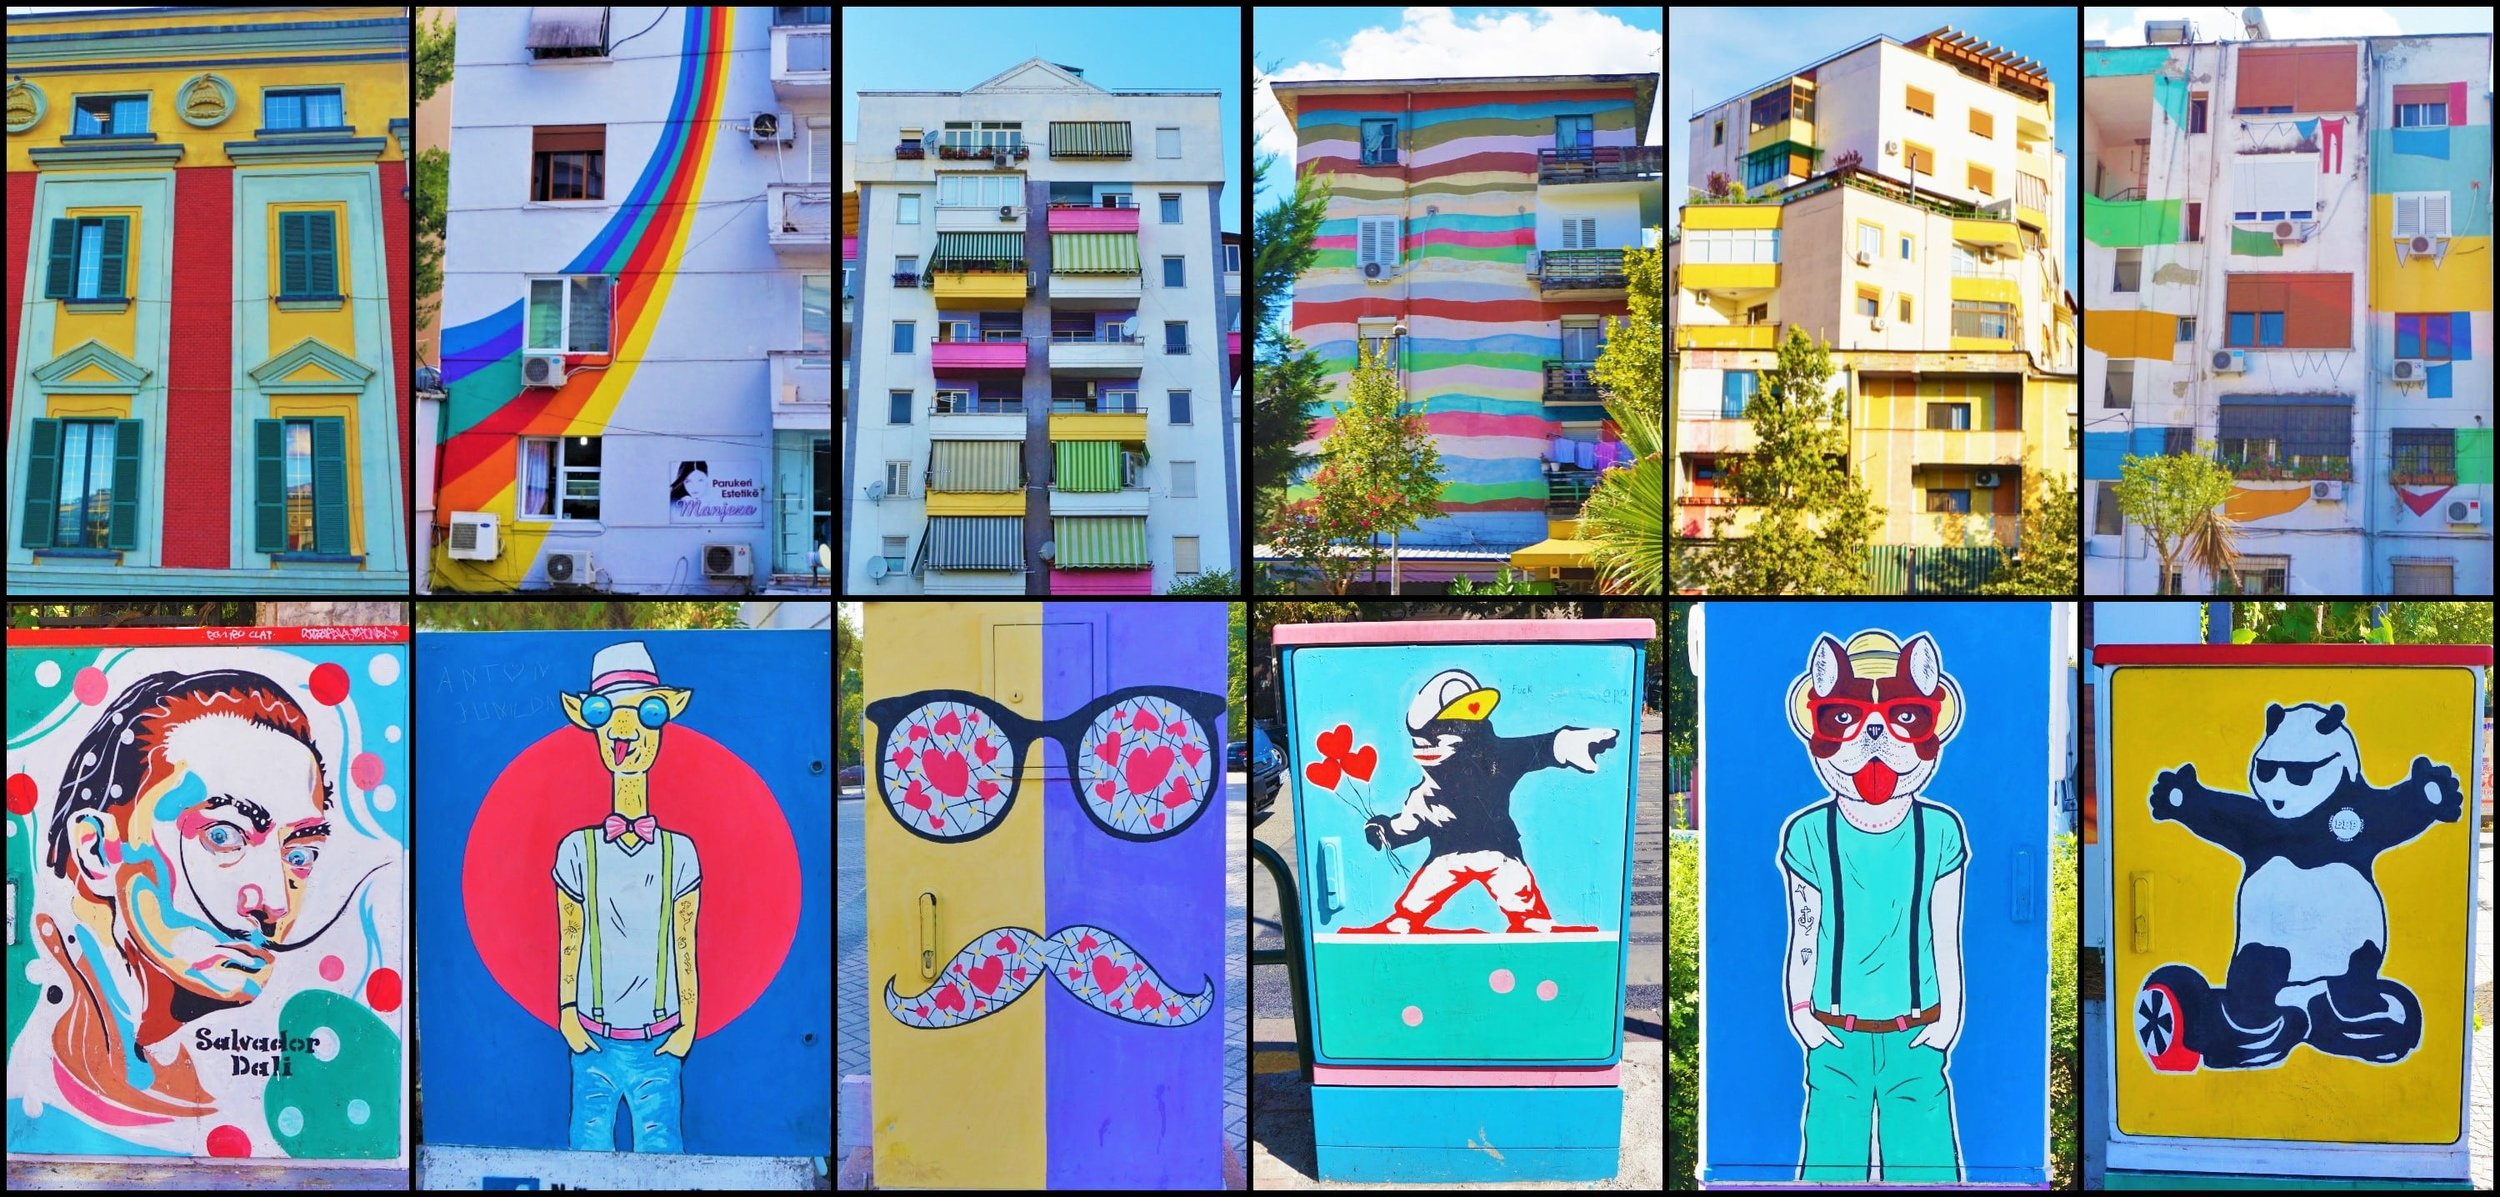 You'll find beautiful street art everywhere around Tirana.